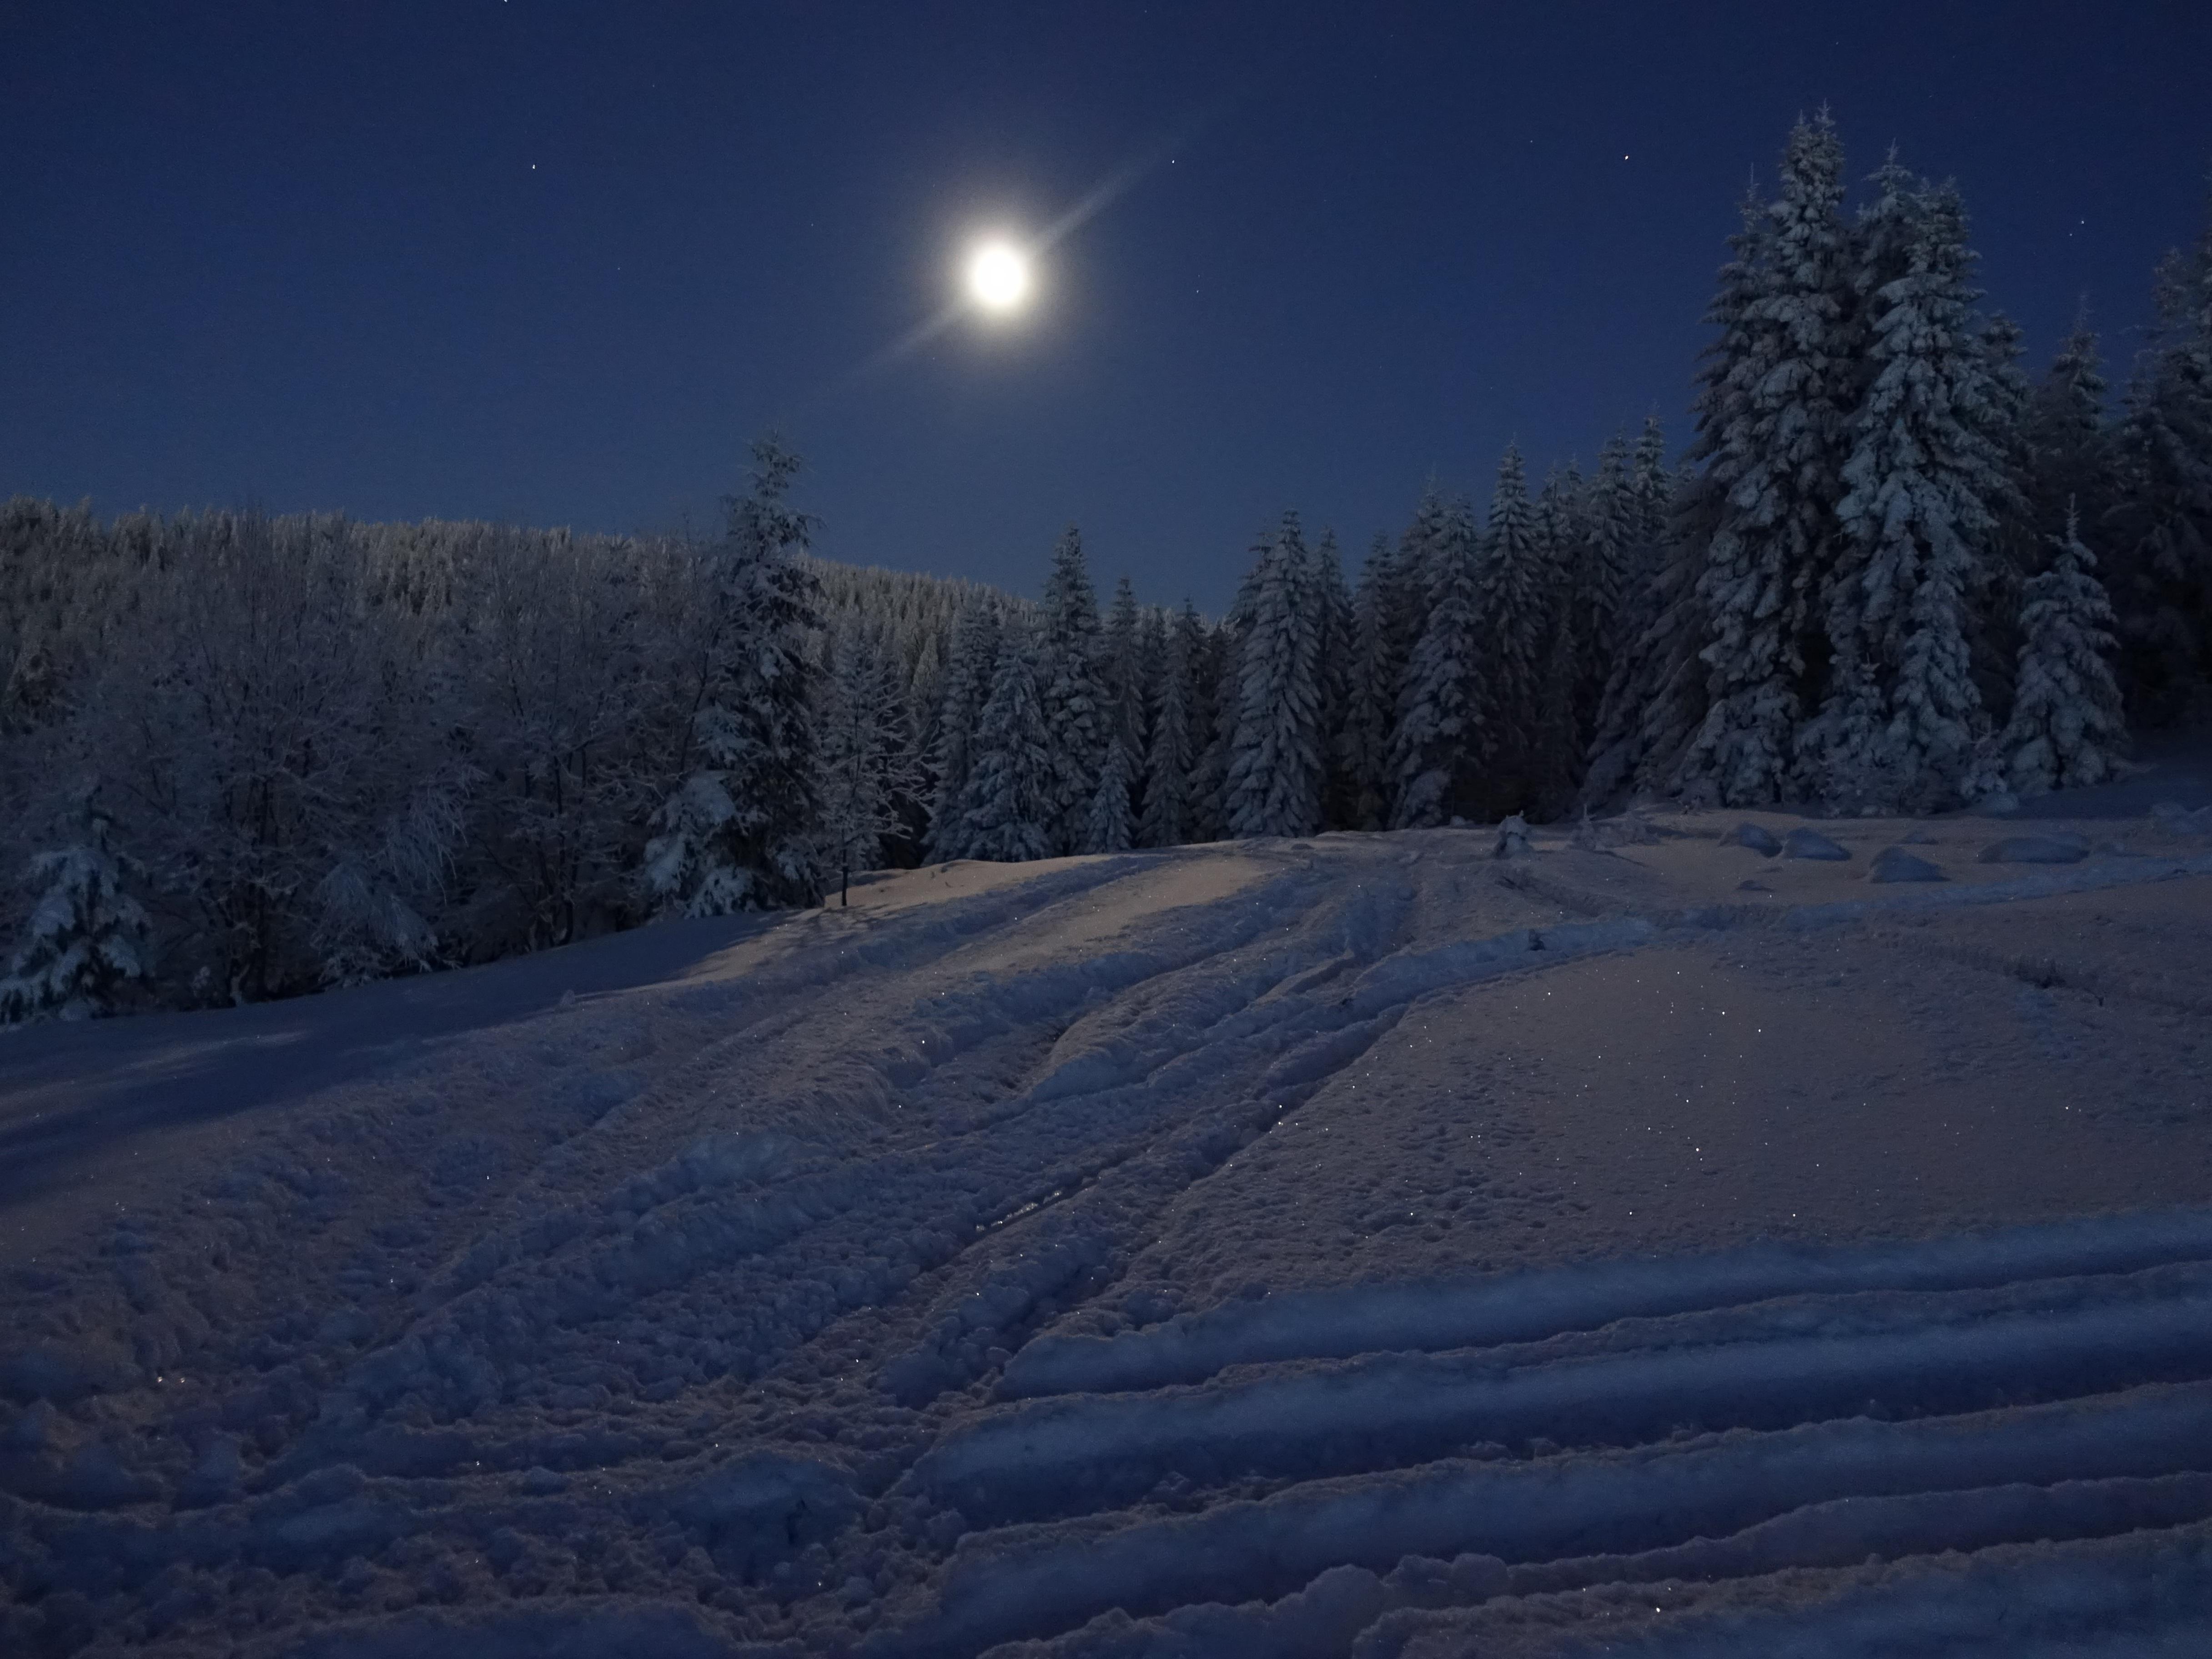 paisaje montaa nieve invierno blanco ver escarcha clima temporada montaas caliente asombroso pista congelacin invierno en - Navidades Asombrosas